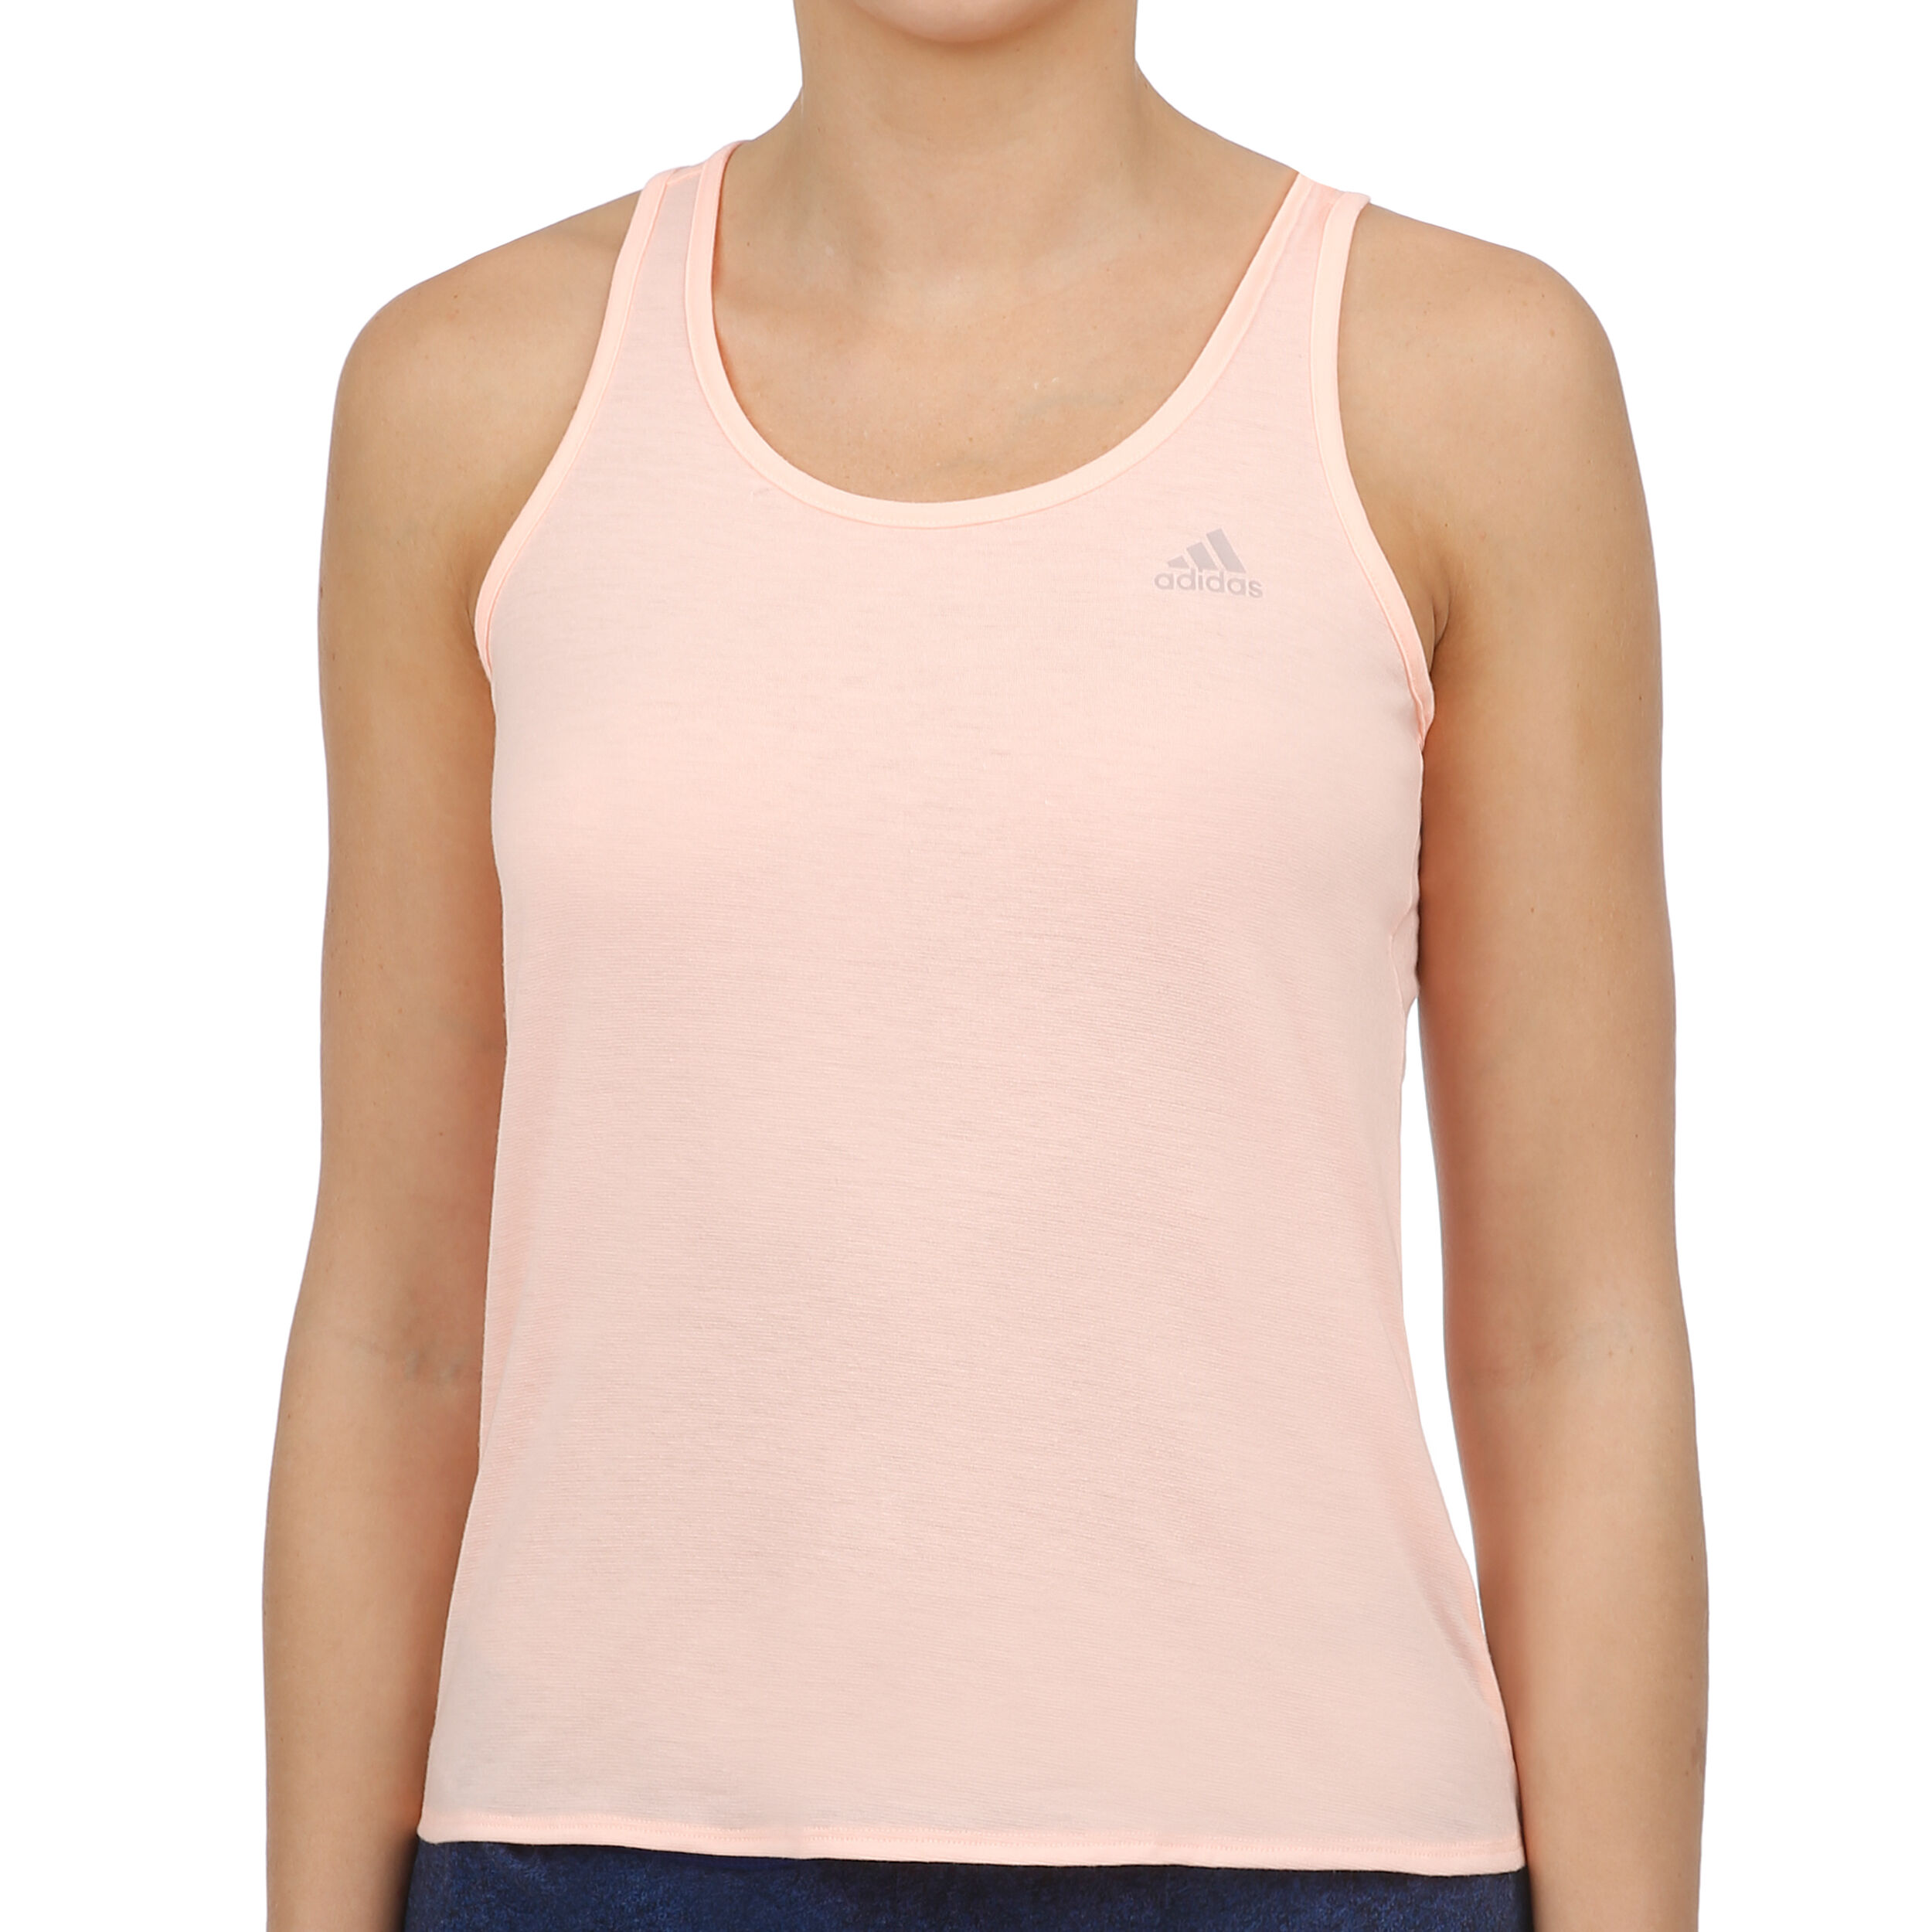 adidas Prime Tank Top Damen Rosa, Grau online kaufen